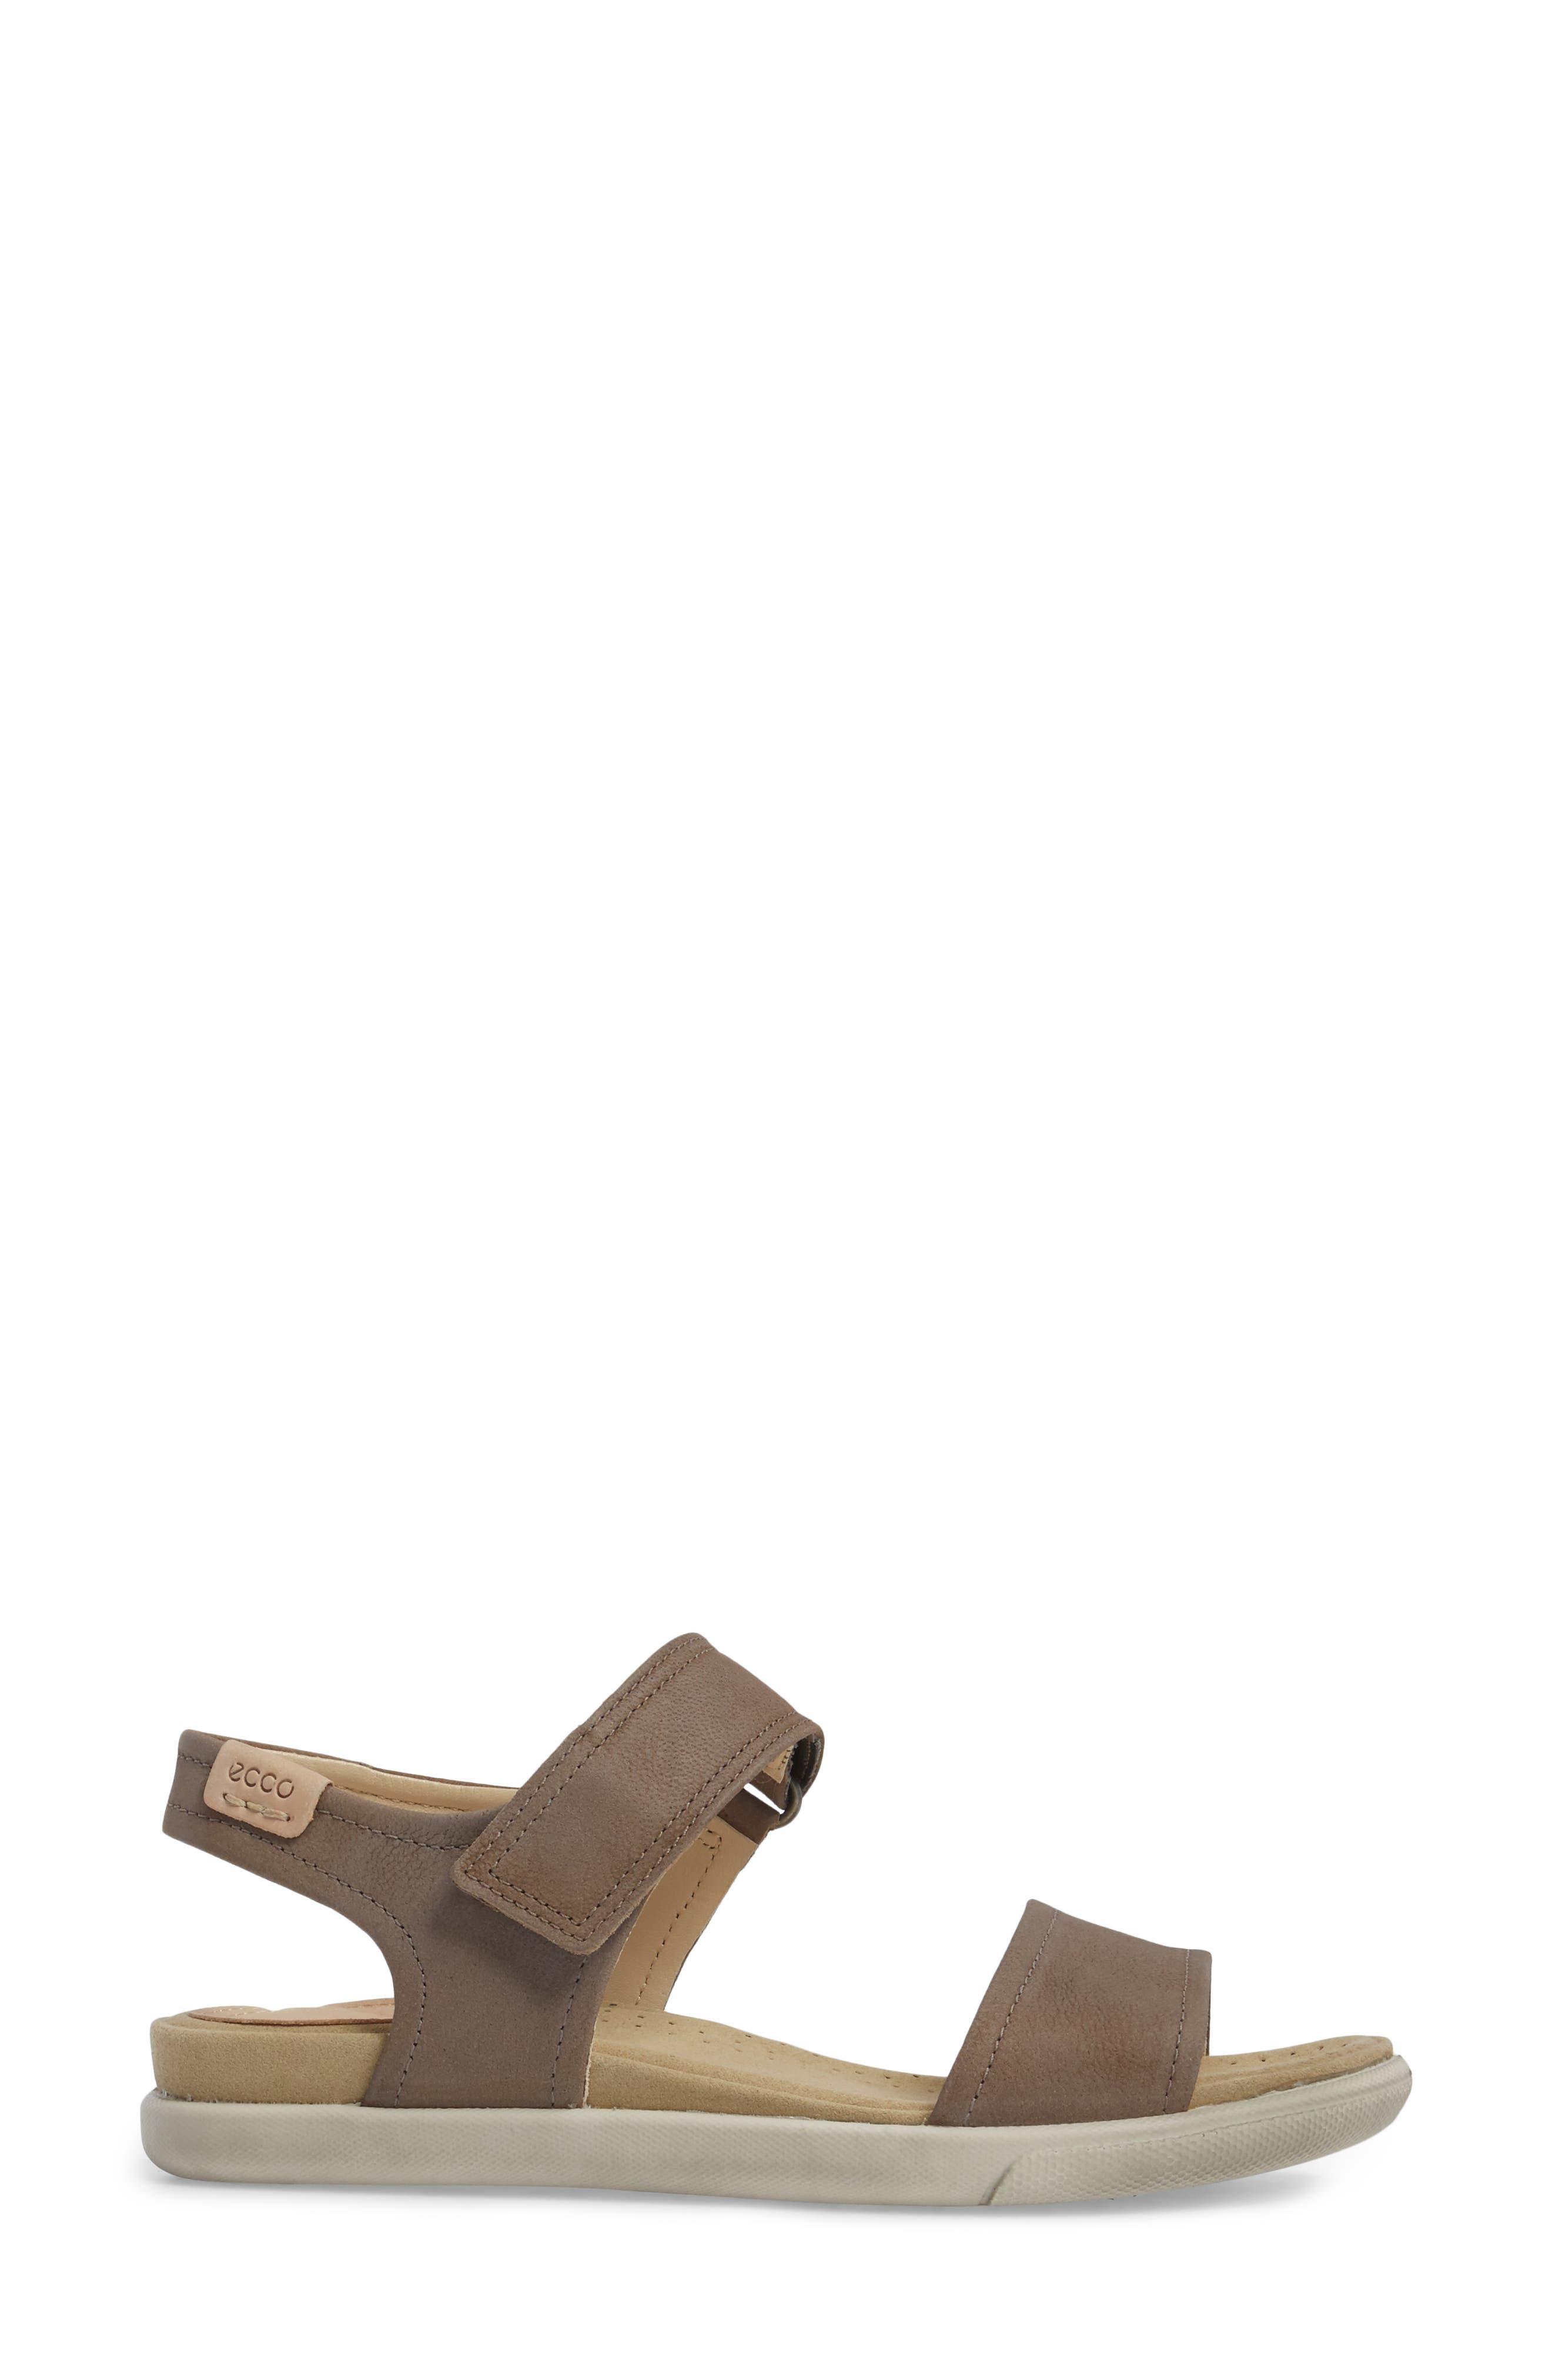 'Damara' Strap Sandal,                             Alternate thumbnail 8, color,